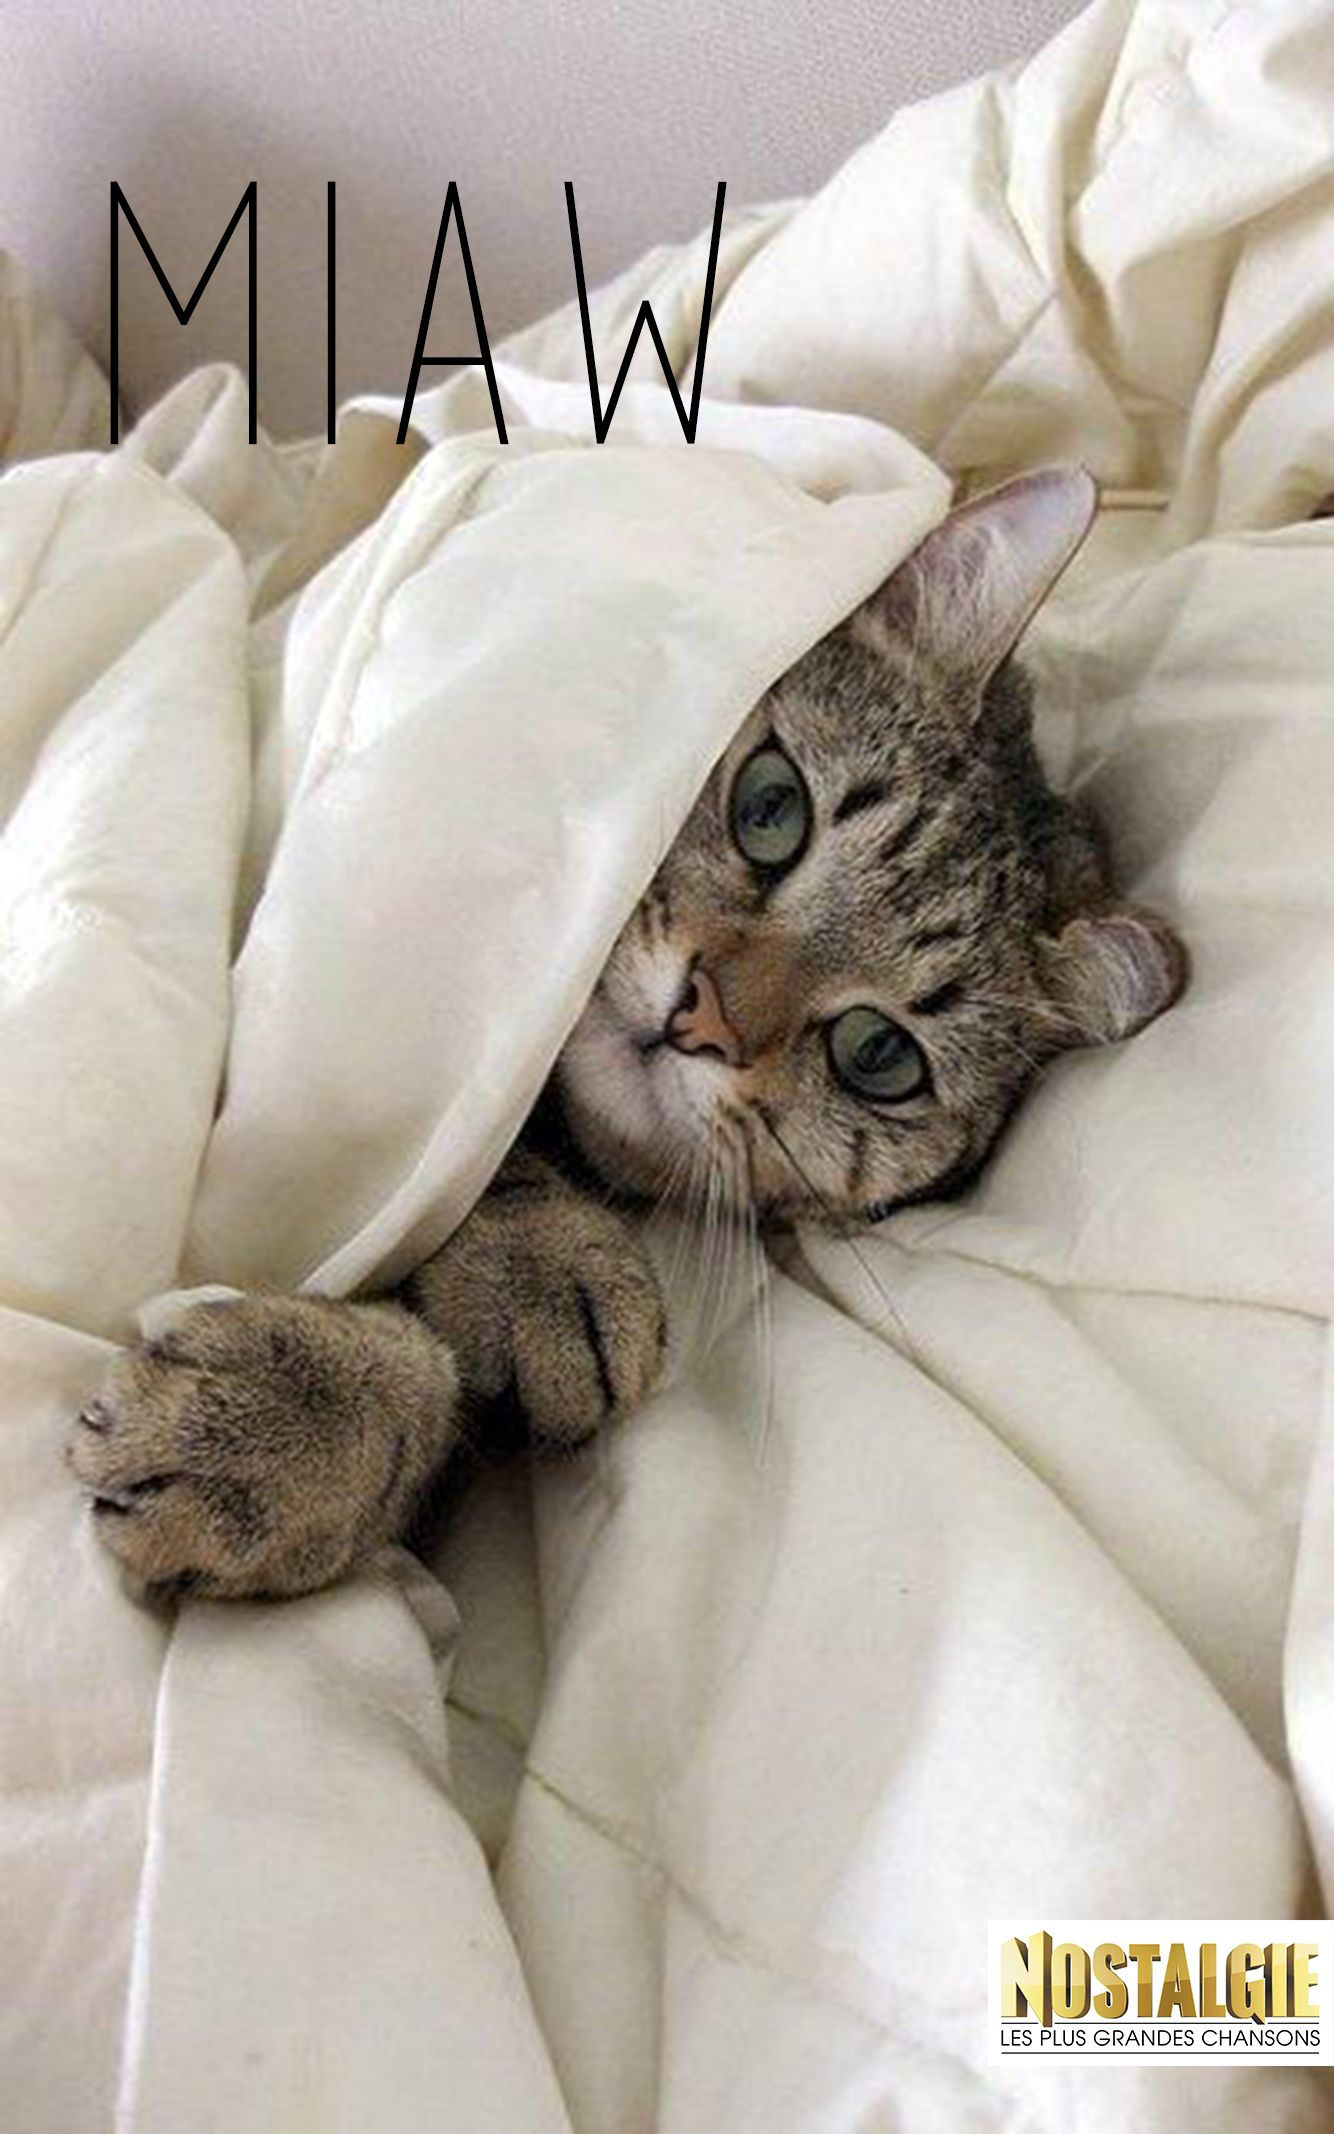 #mayaacra #nostalgieliban #miaw #pet #pets #cute #cat #morning #bonjour